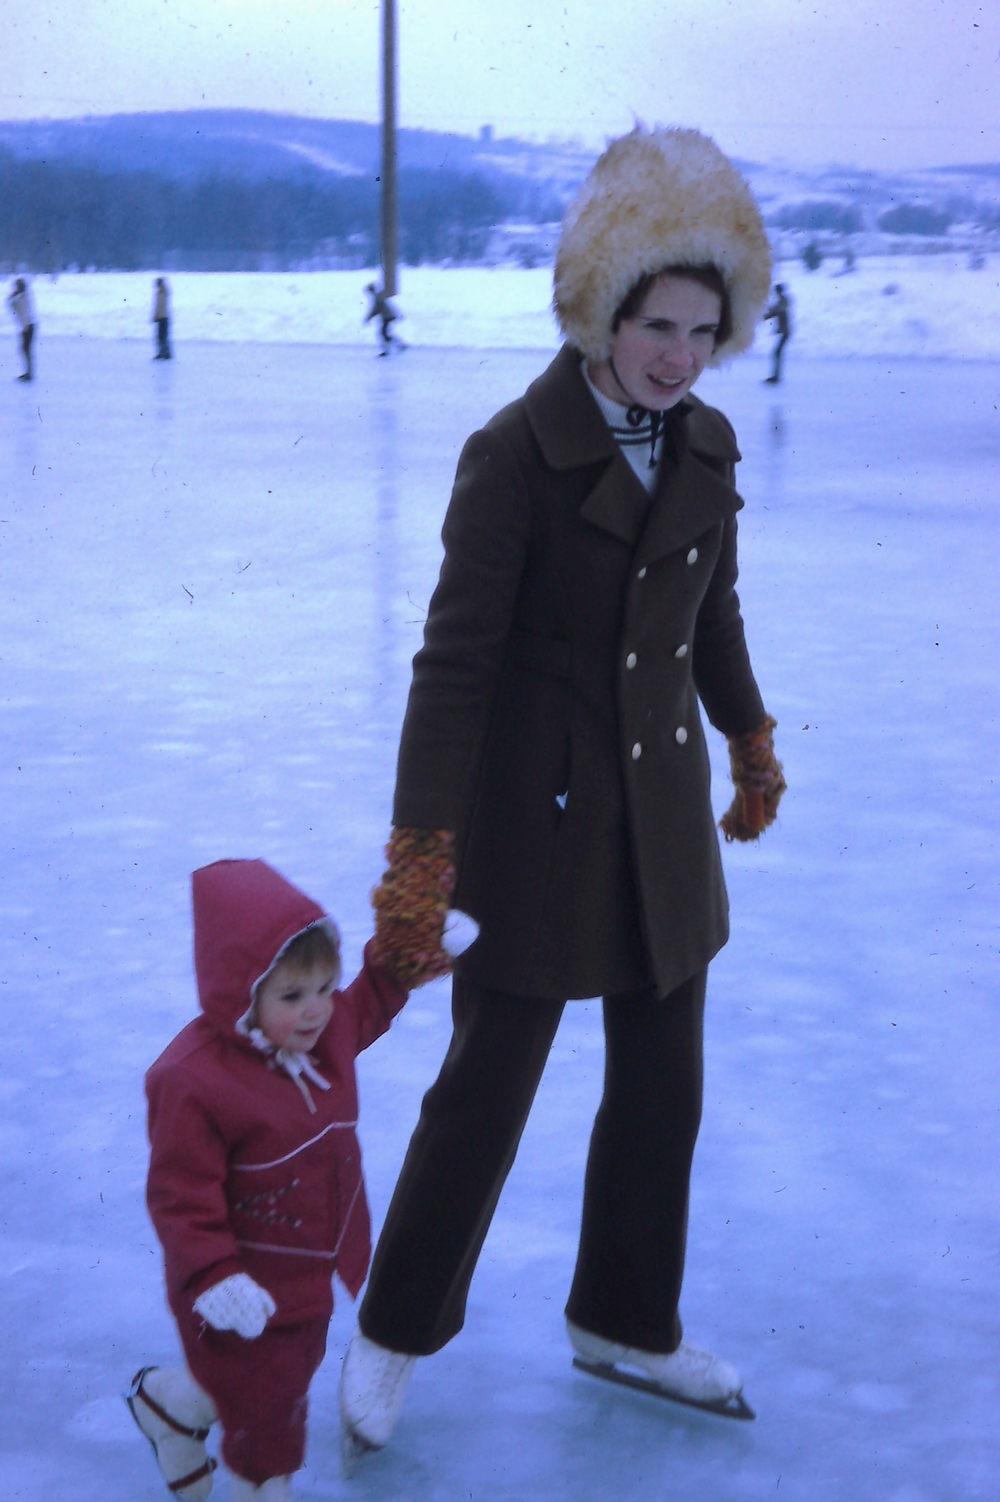 skatingmom